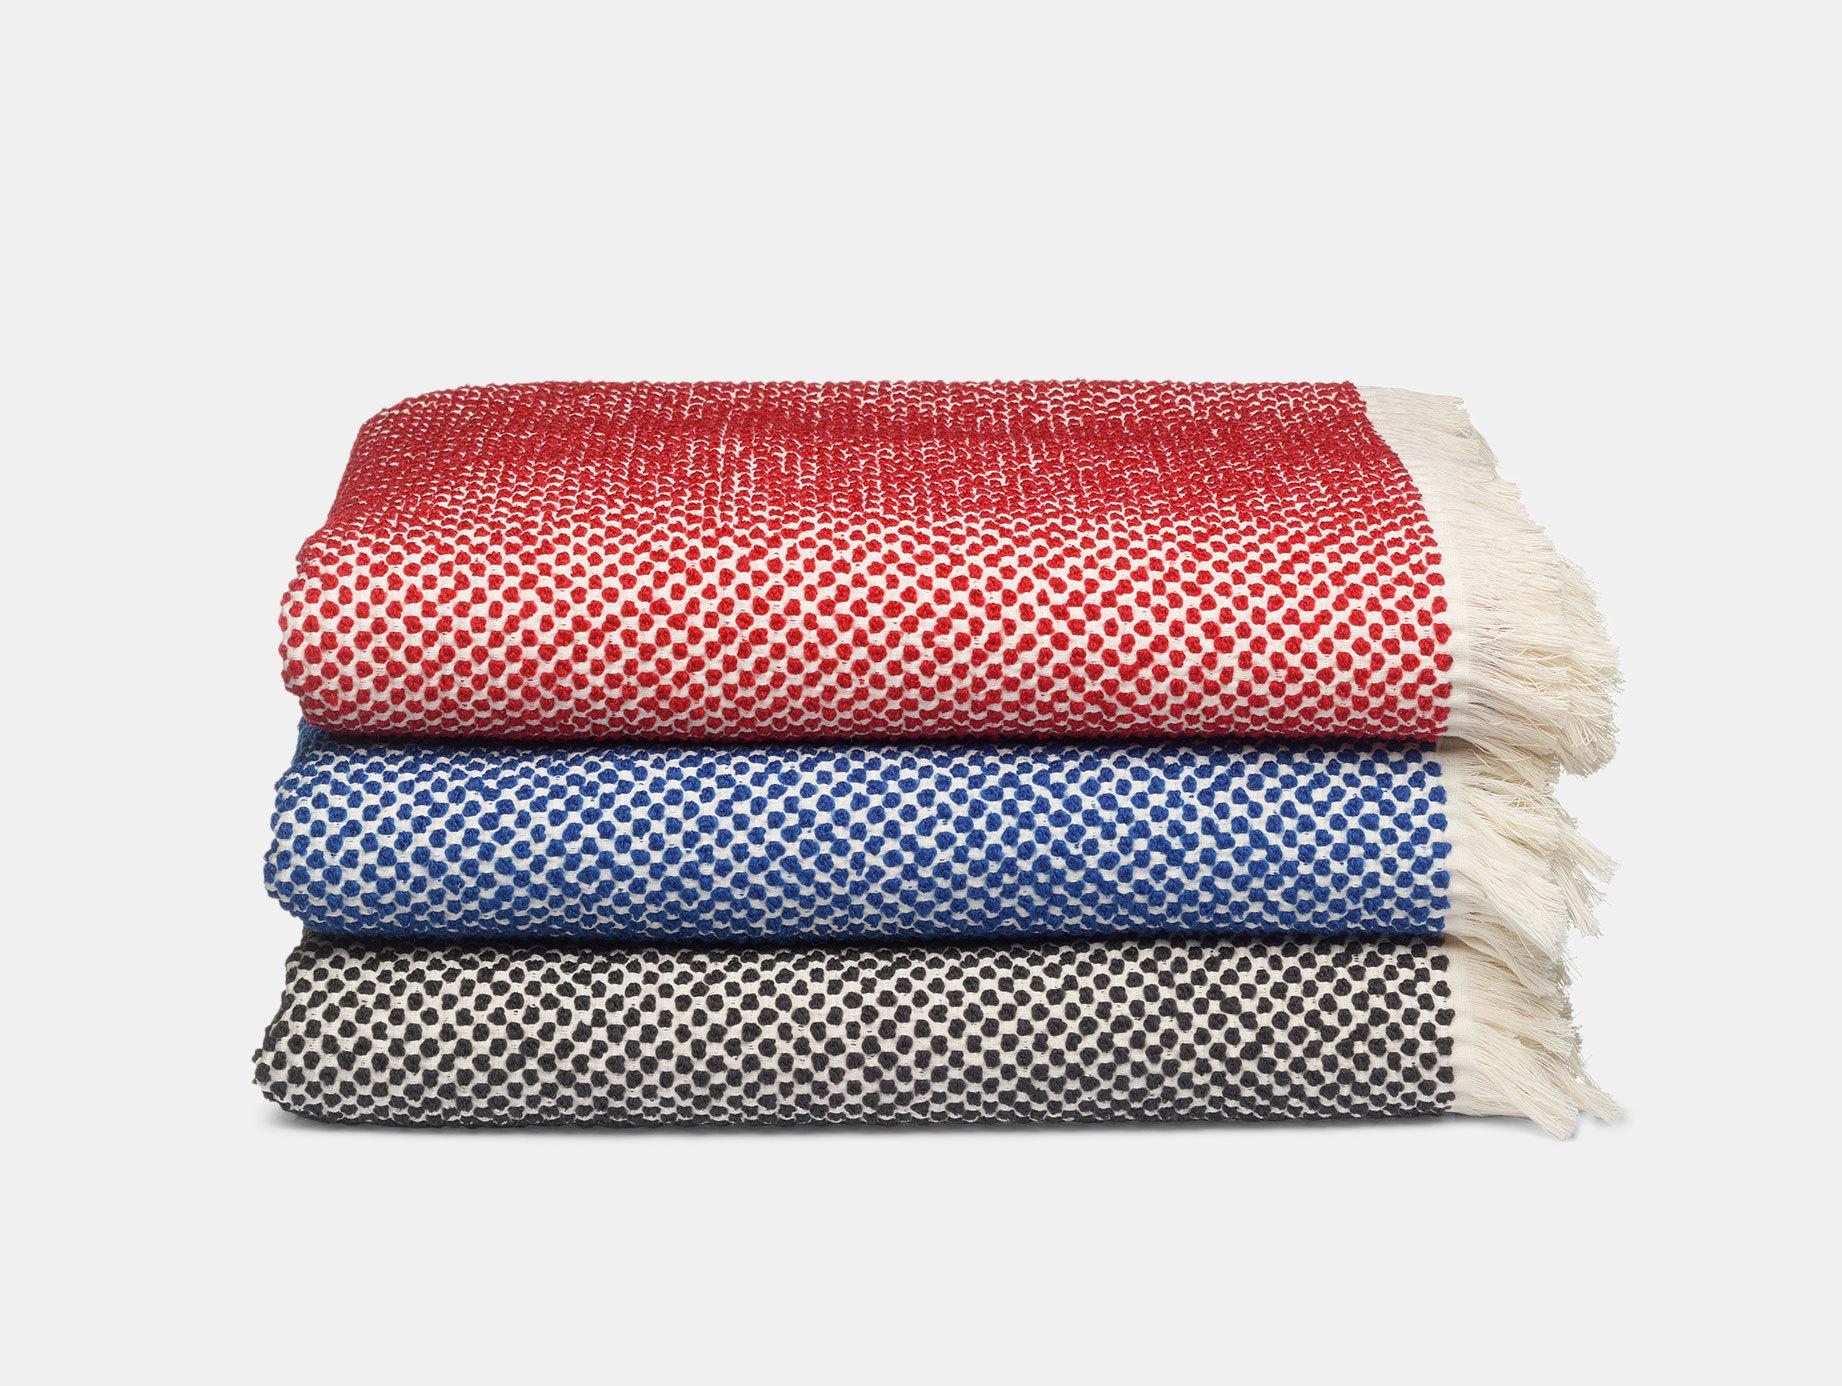 E15 Dotto Blankets